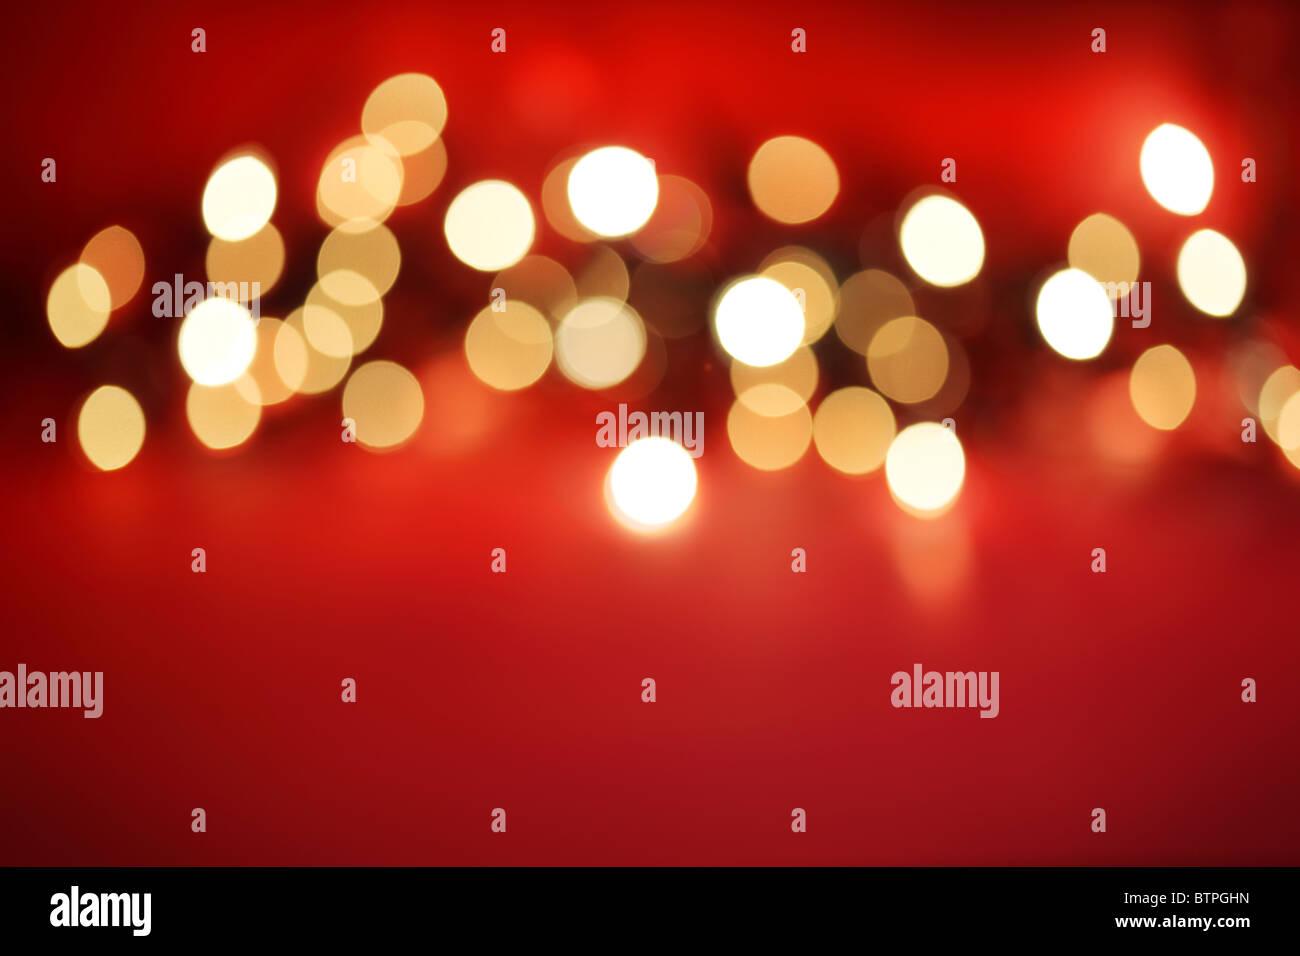 Defocussed lights on red - Stock Image